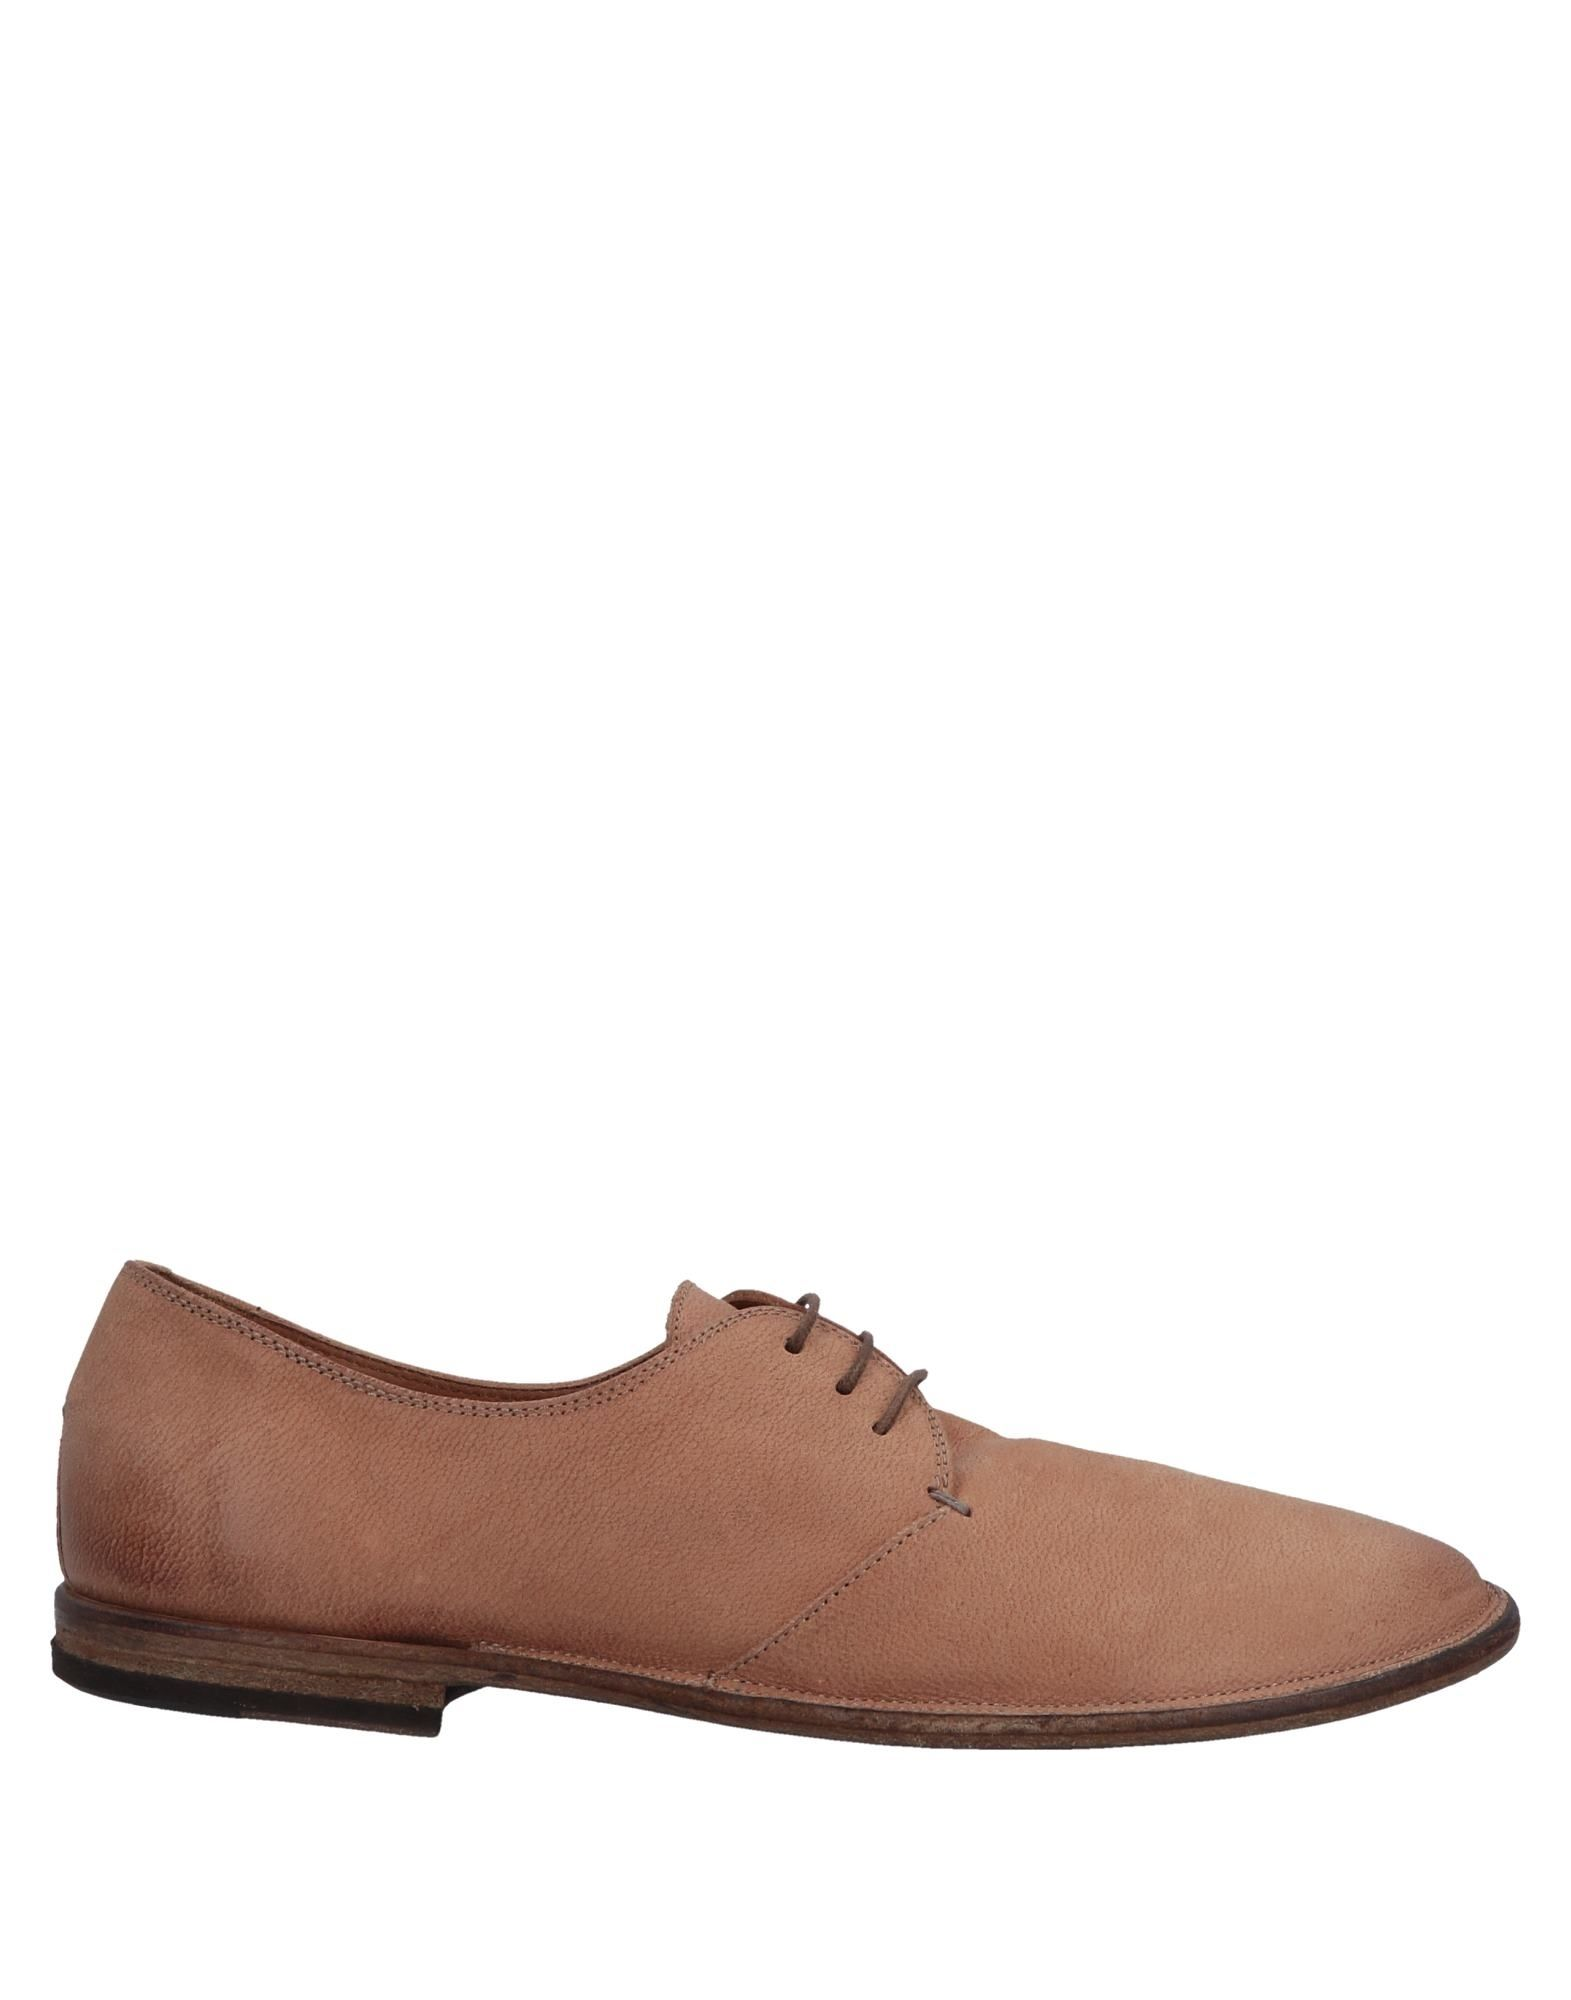 Фото - PANTANETTI Обувь на шнурках туфли pantanetti 12540d salvia